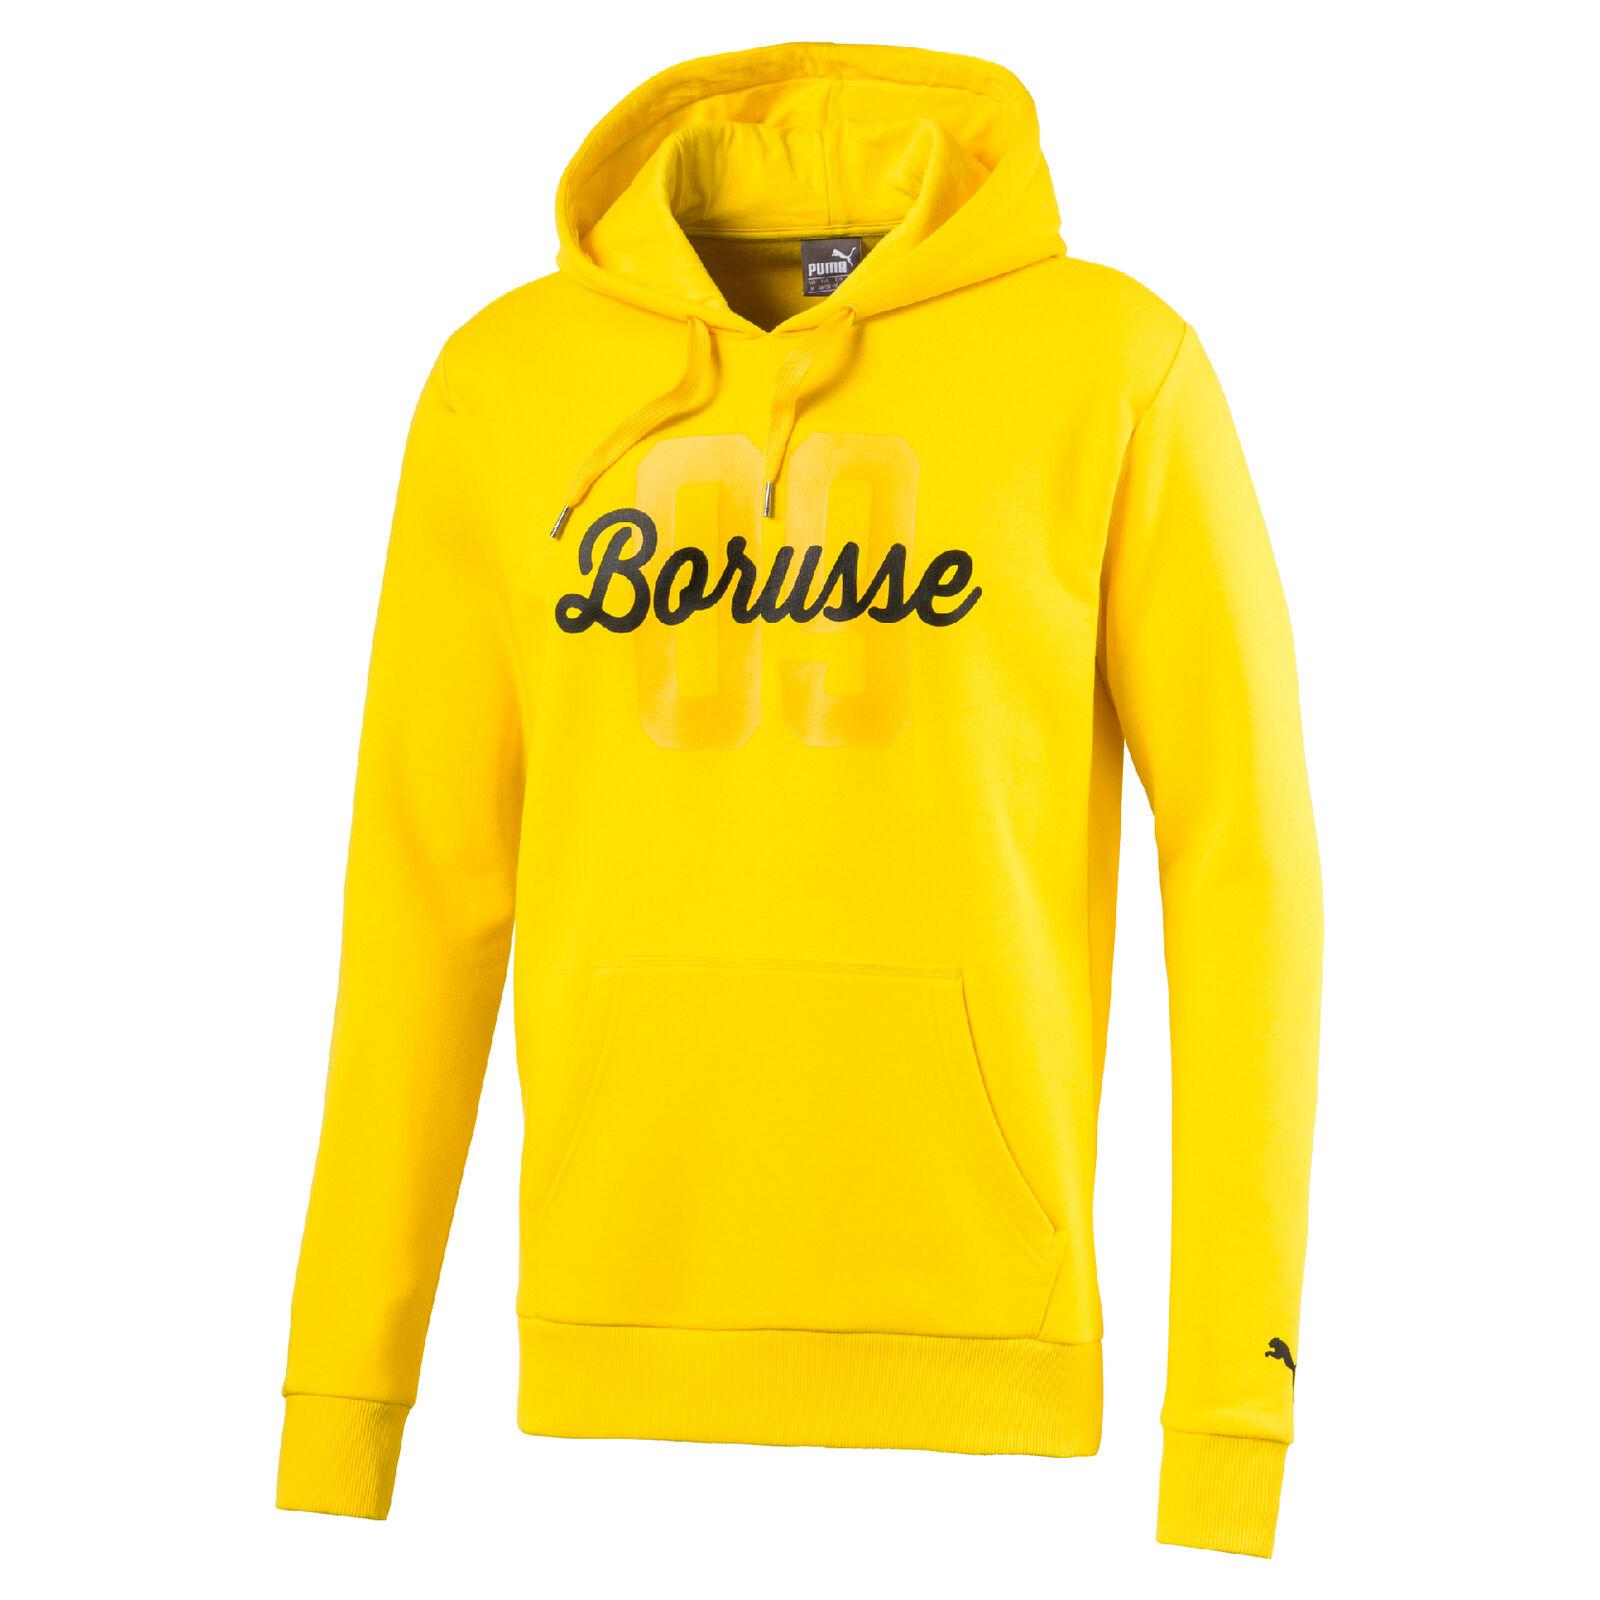 Puma BVB Borussia Dortmund BORUSSE Hoody Sweatshirt Gr.XXL 751828-01 UVP 64,95€